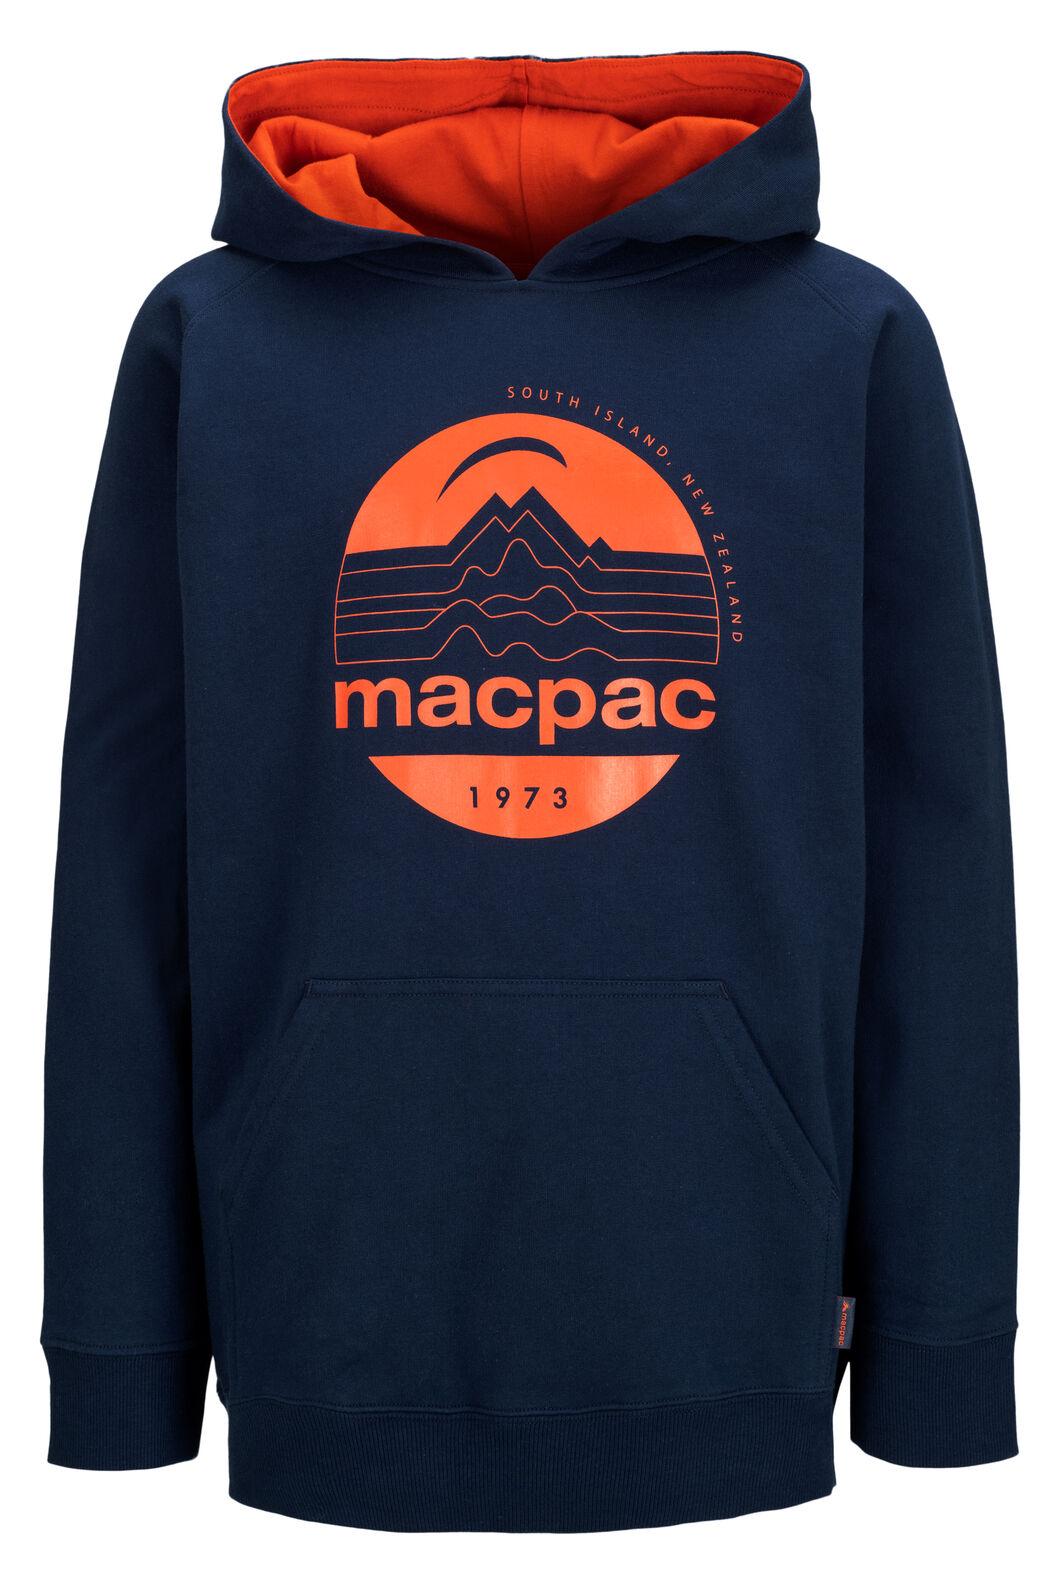 Macpac Fairtrade Organic Cotton Pullover Hoody — Kids' (V2), Black Iris/Pureed Pumpkin, hi-res